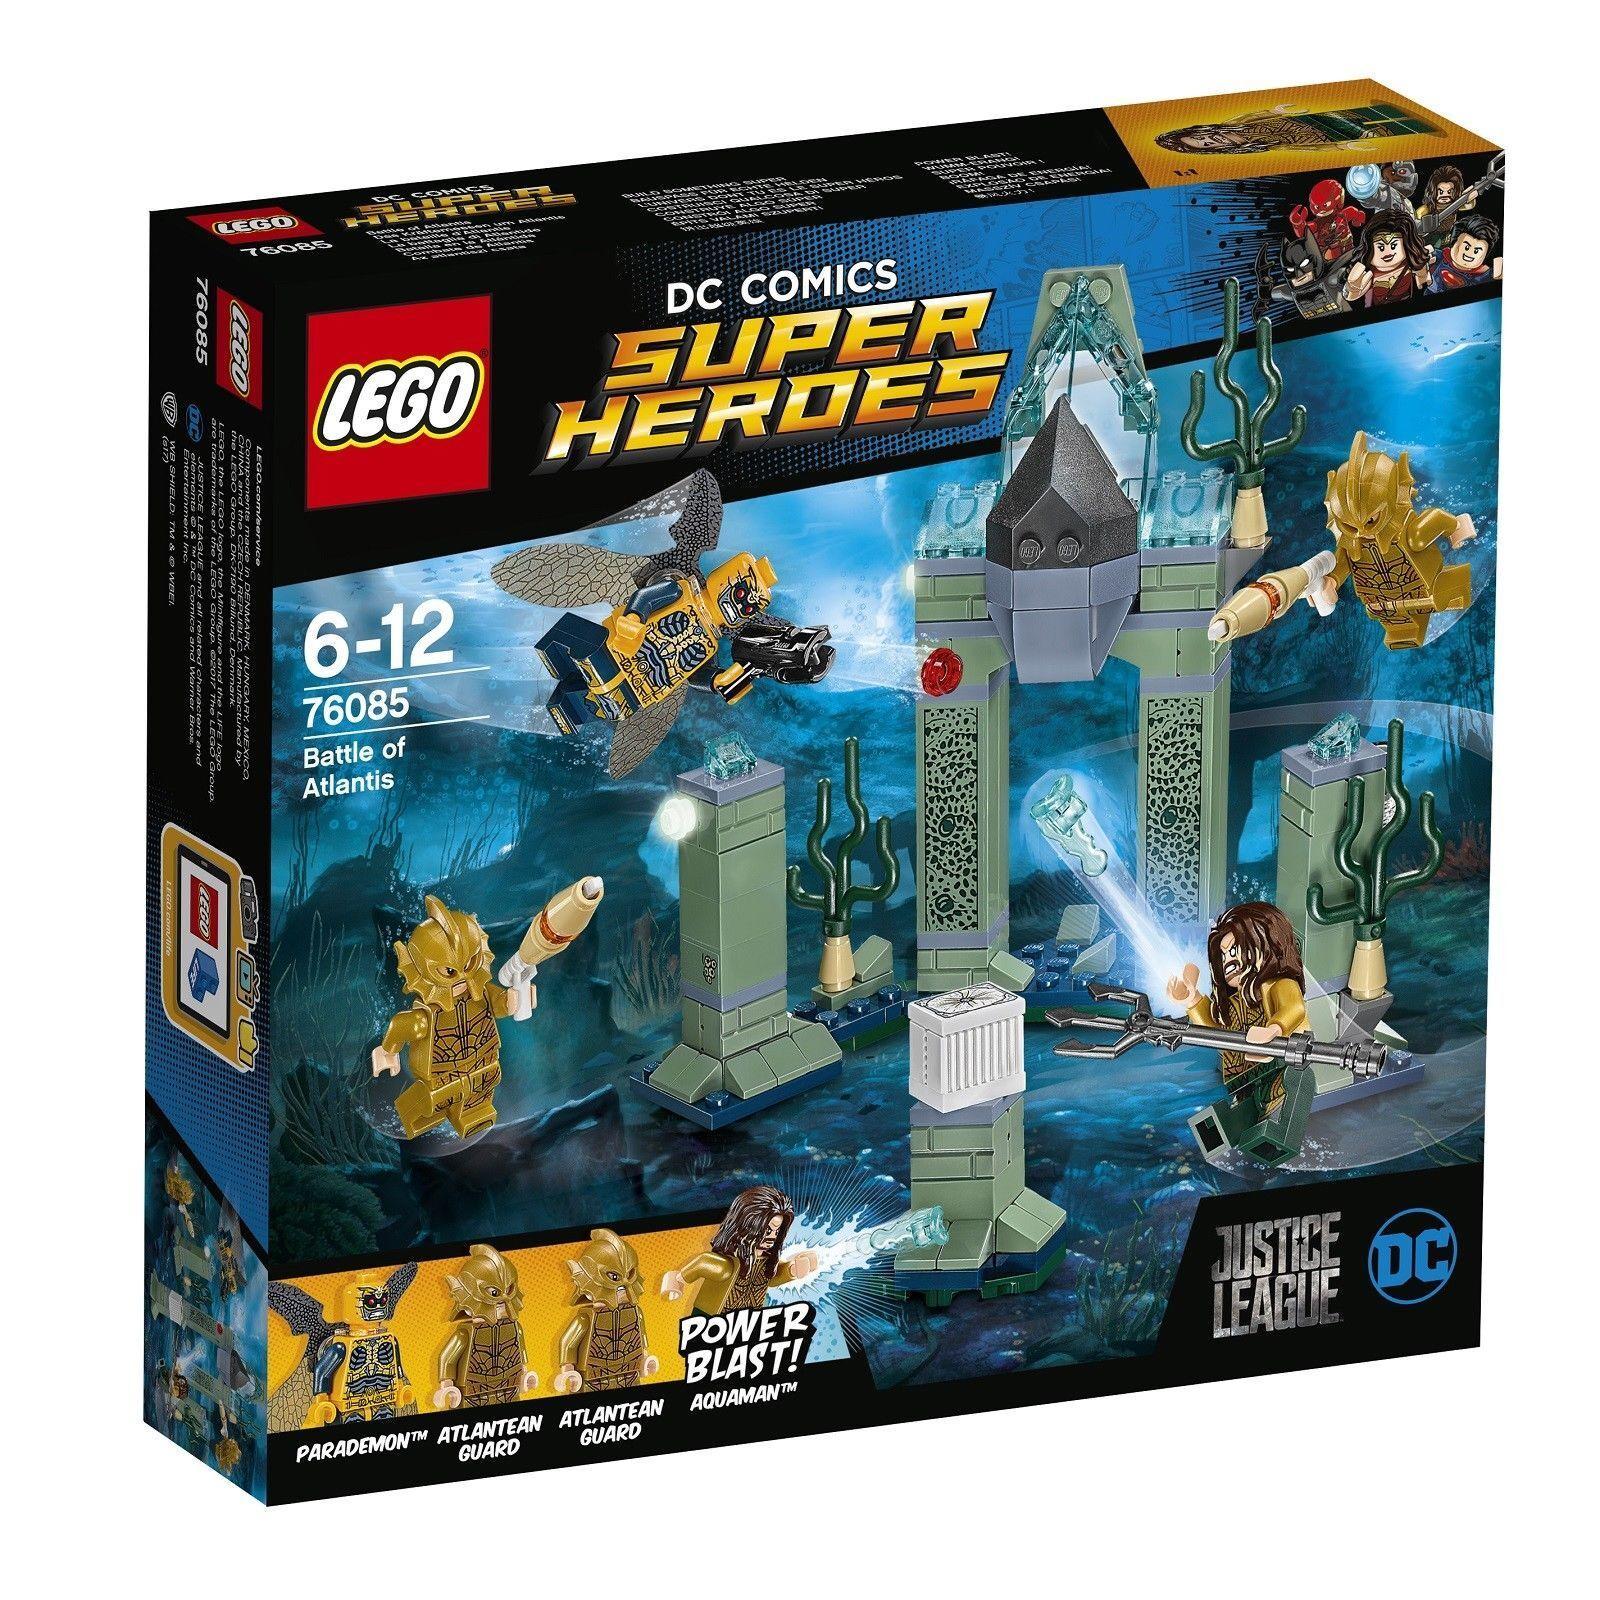 LEGO DC Comics Super Heroes Battle of Atlantis 2017 (set 76085) Brand new